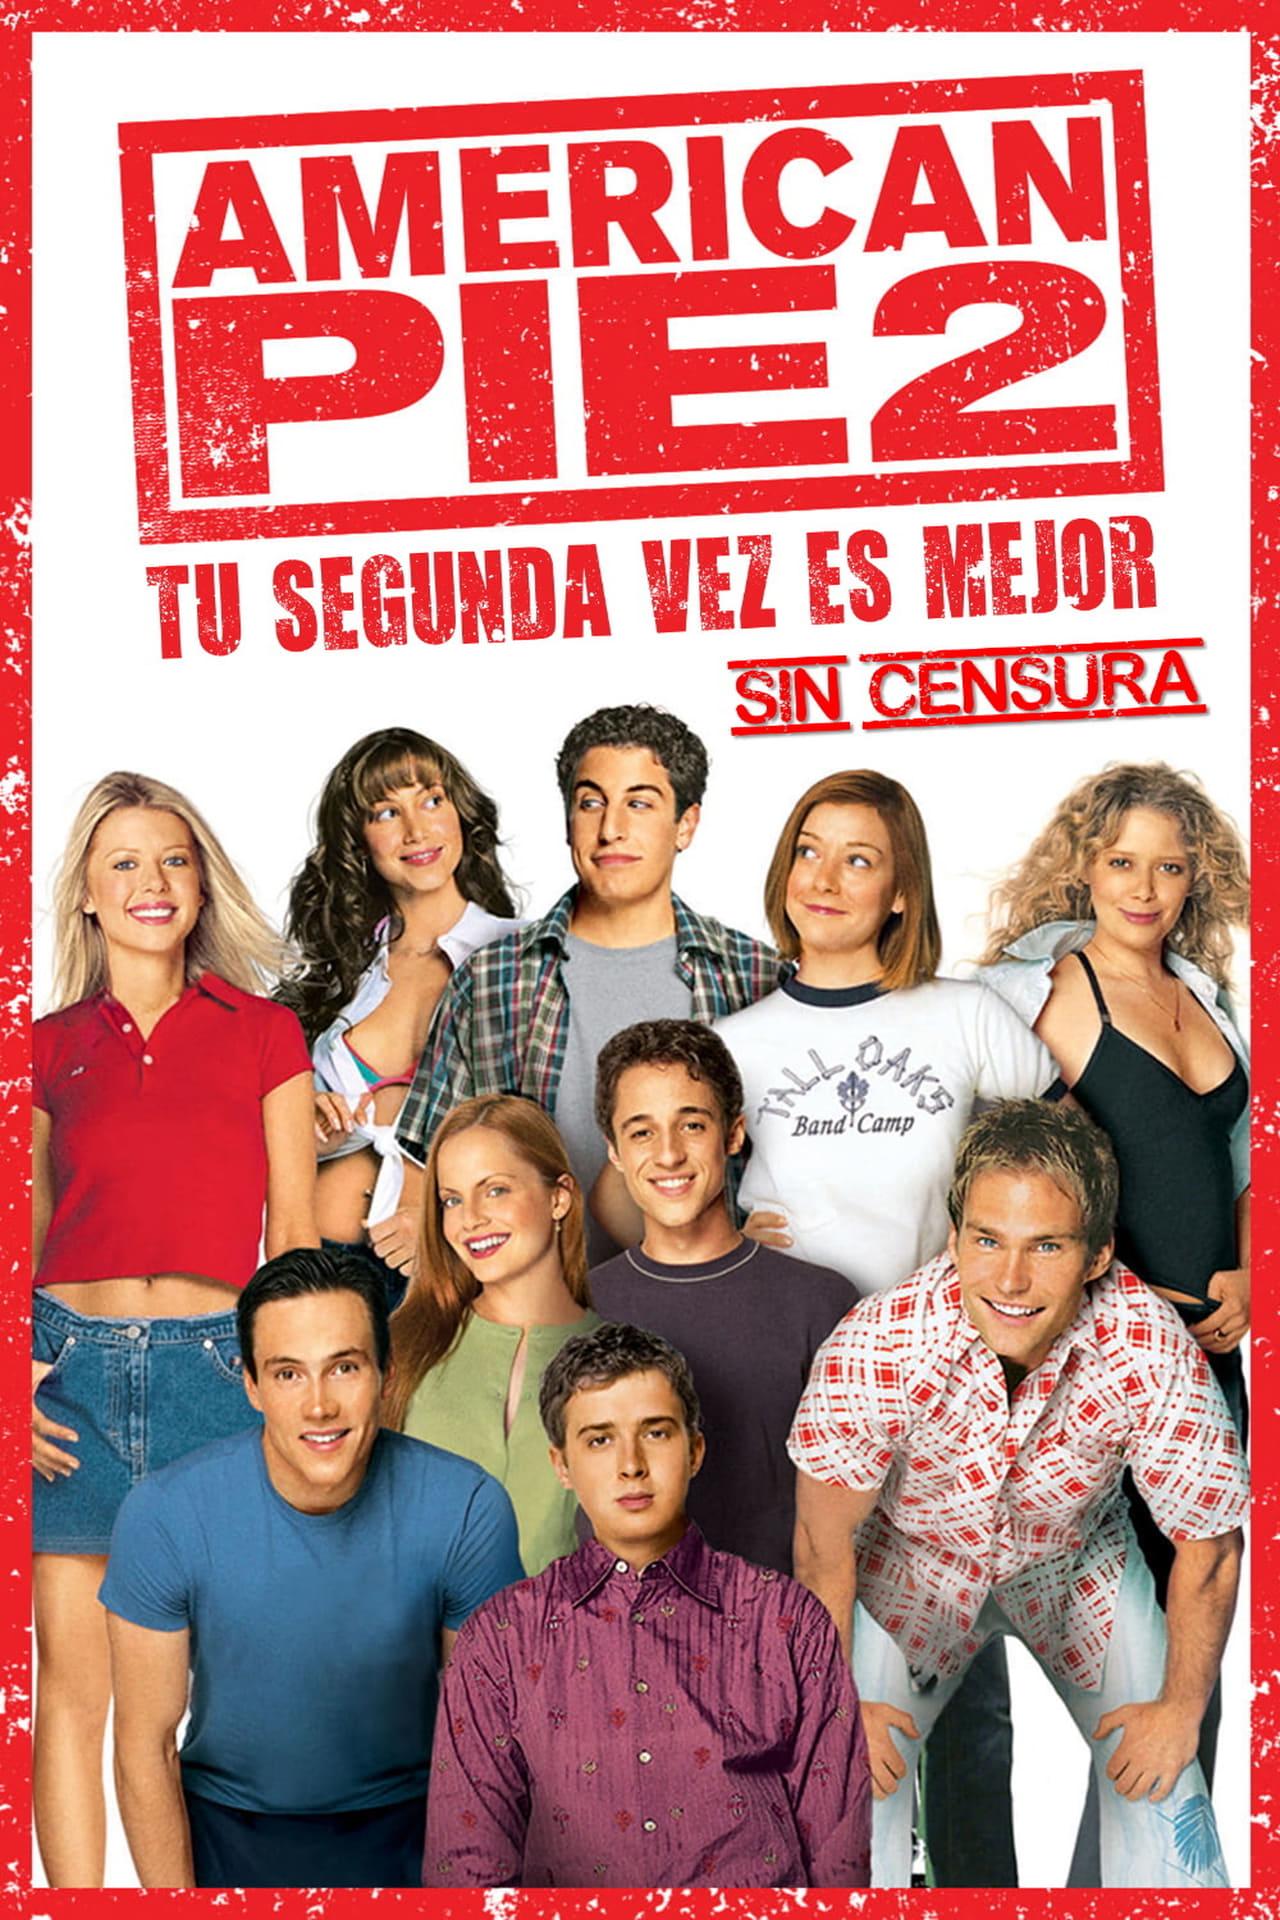 American Pie 2 DVD Release Date January 15, 2002